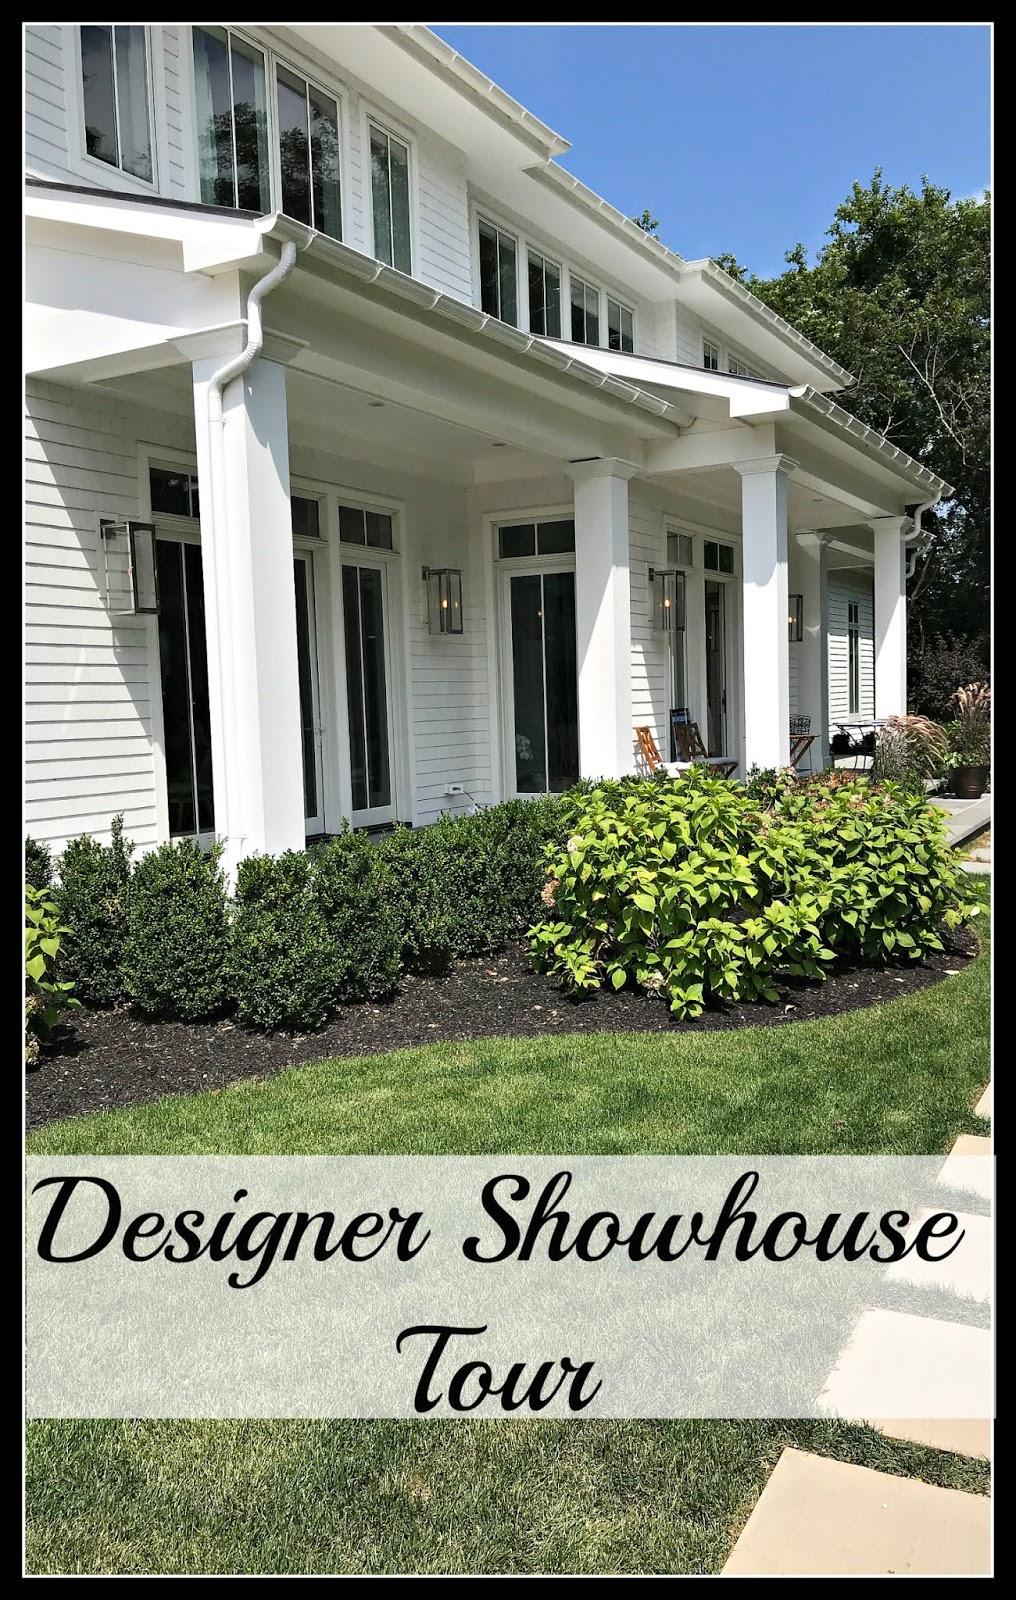 Hampton Designer Showhouse Tour